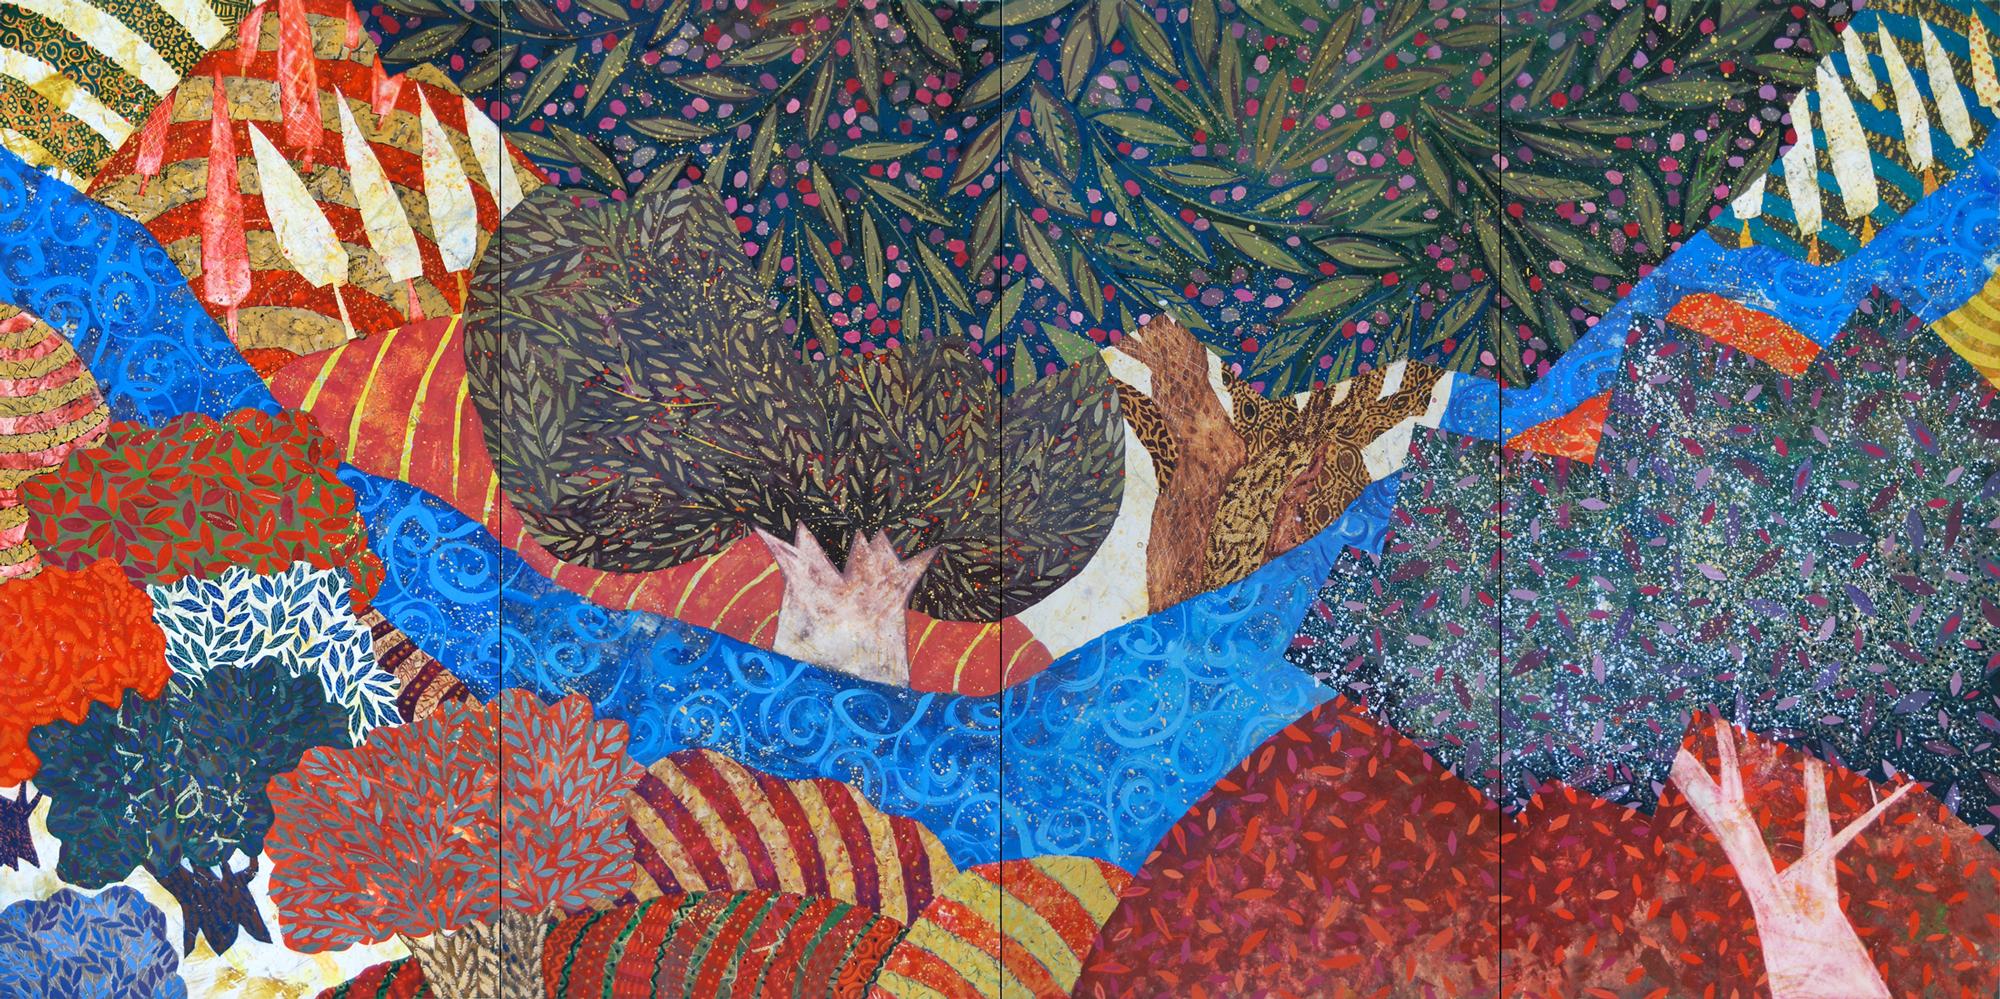 Planted by Waters 2016 by Chanan Mazal' שתול על מיד, ציור של חנן מזל